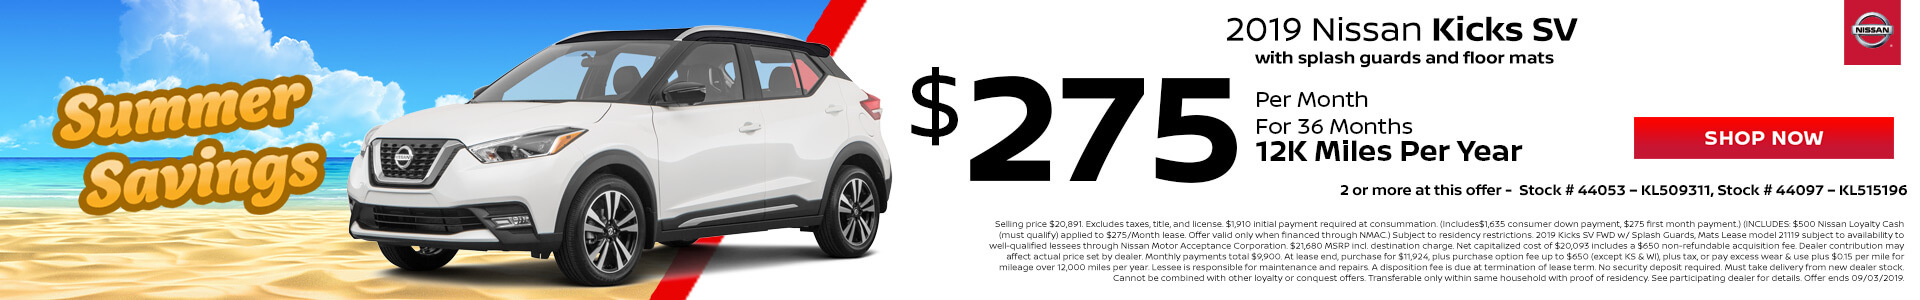 Nissan Kicks $275 Lease